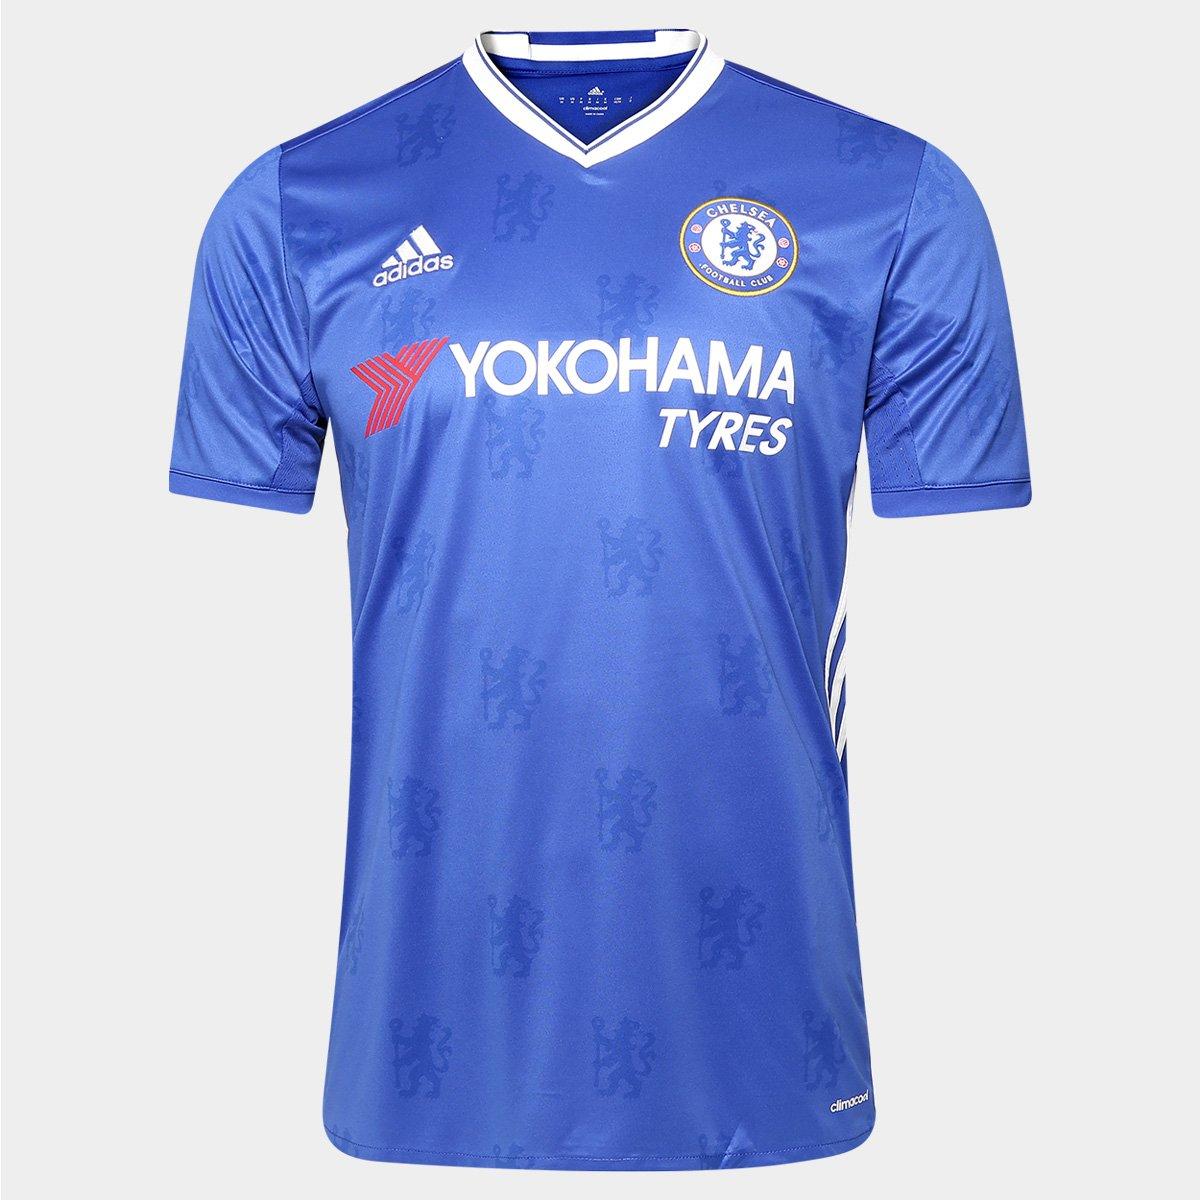 c744358c4fe Camisa Chelsea Home 16 17 s nº - Torcedor Adidas Masculina - Compre Agora